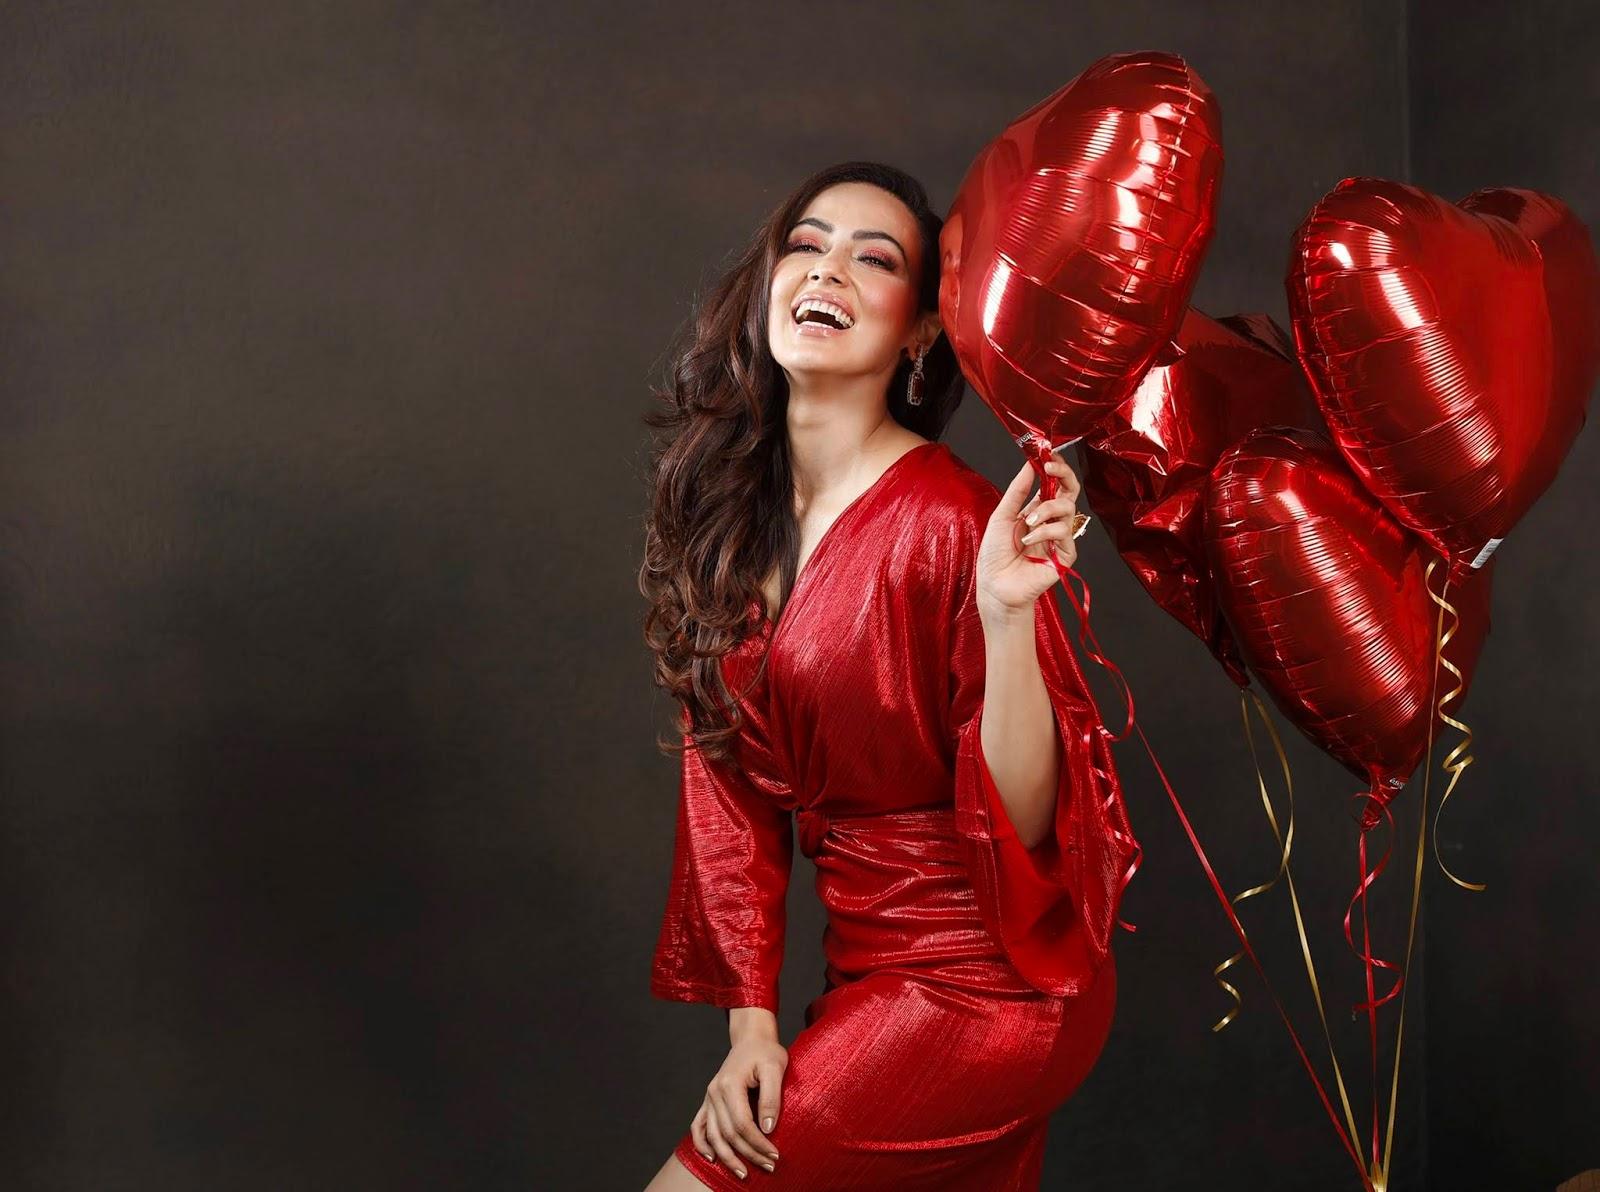 Actress Sana Khan Ace Choreographer Spotted In Ashima Sharma Outfits For A Calendar Shoot